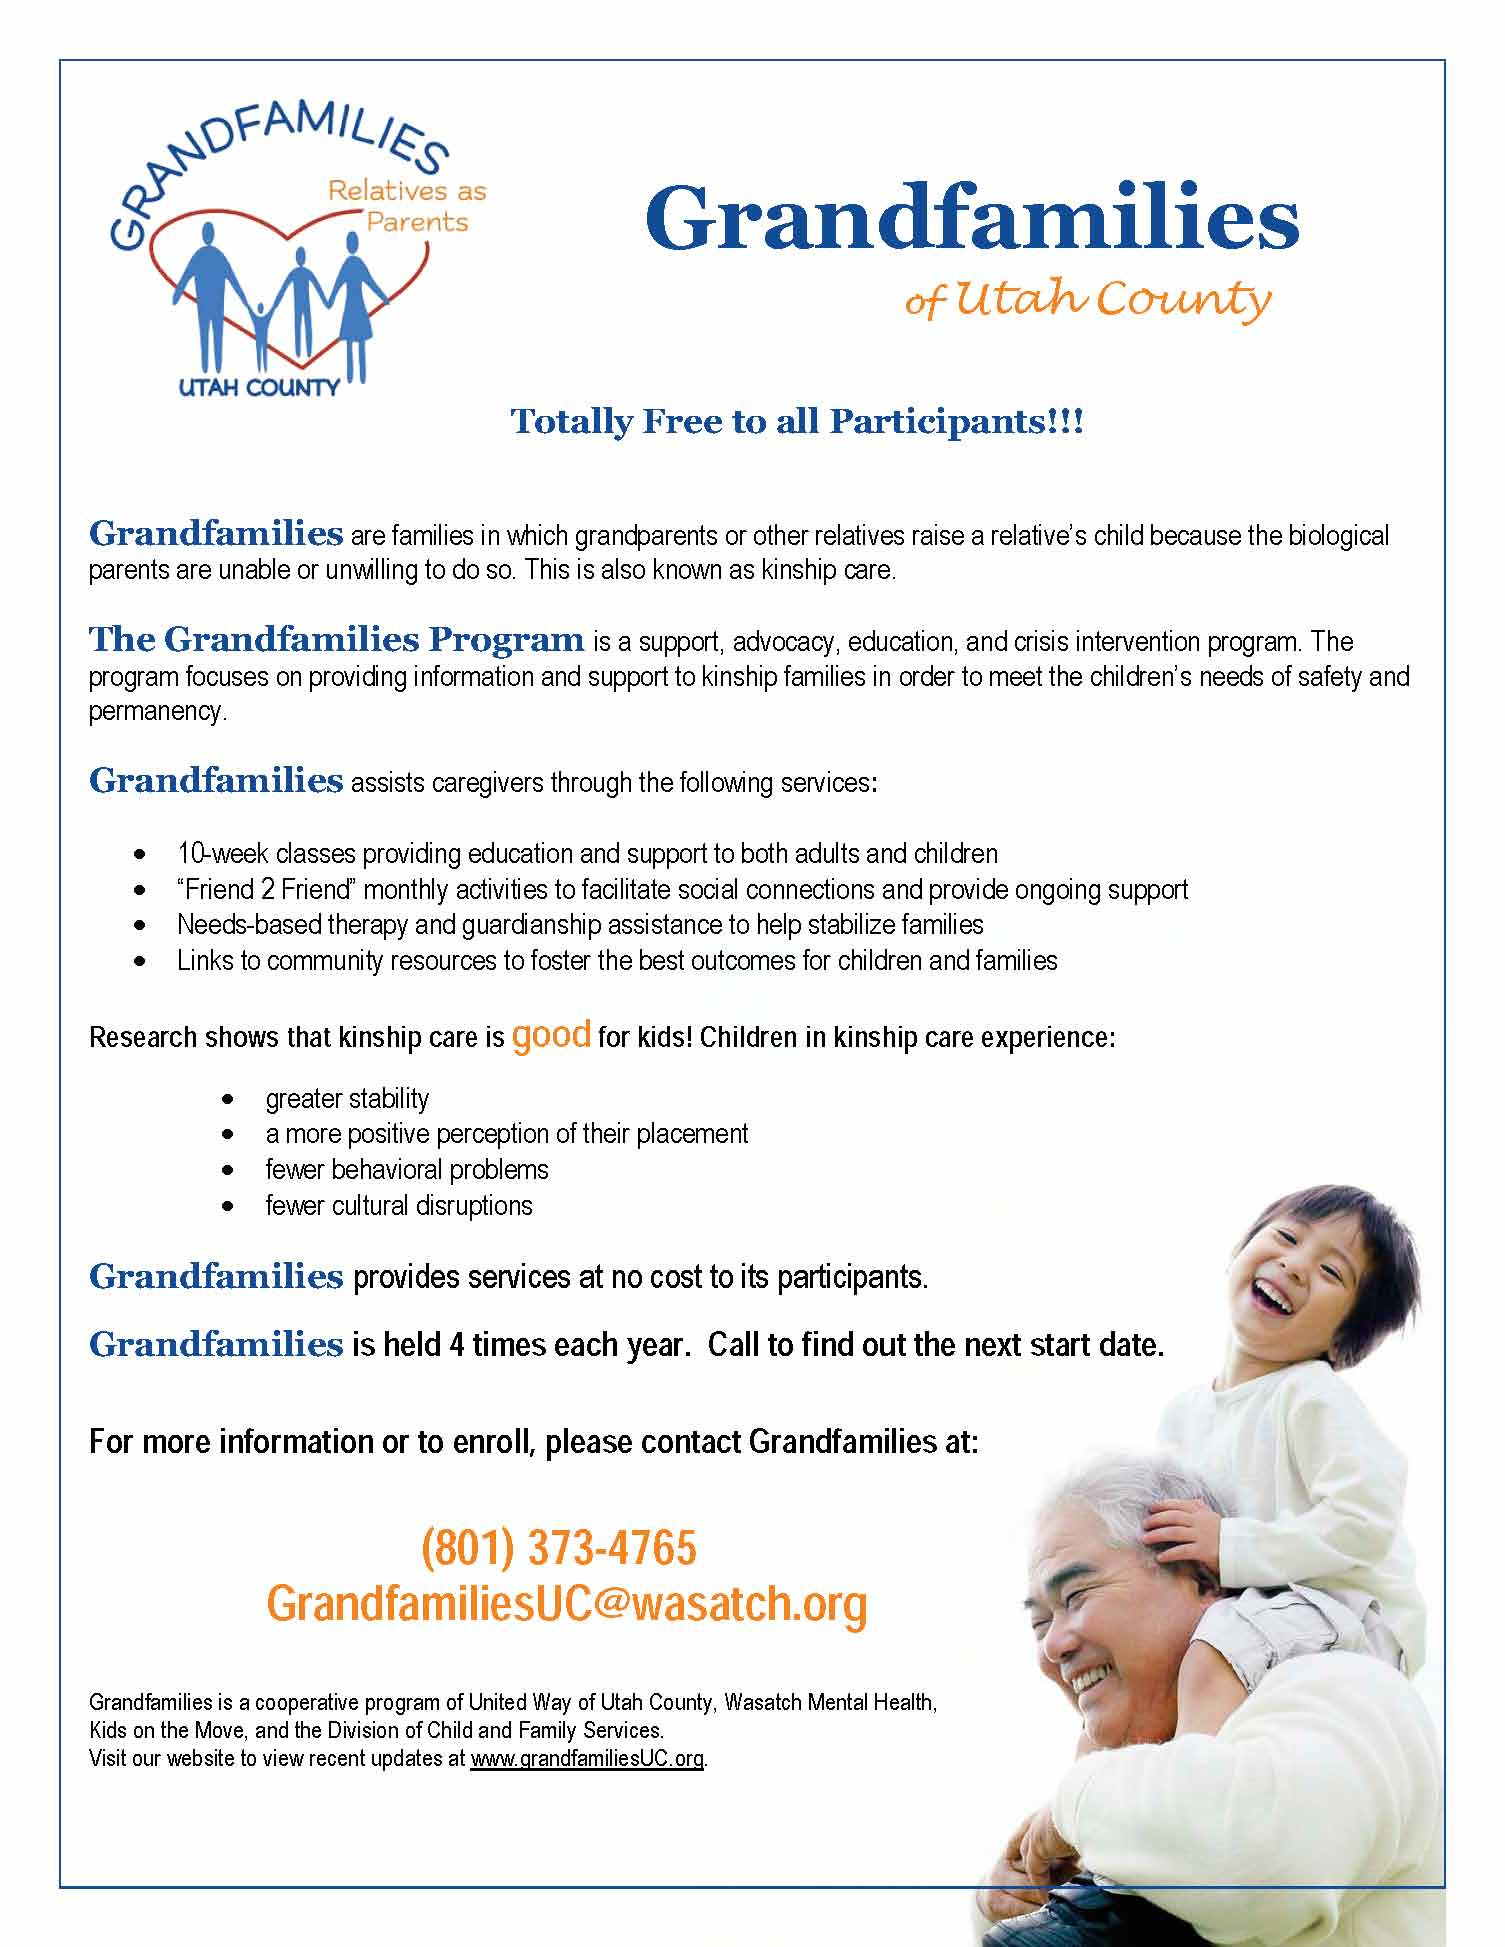 Grandfamilies of Utah County | Wasatch Mental Health